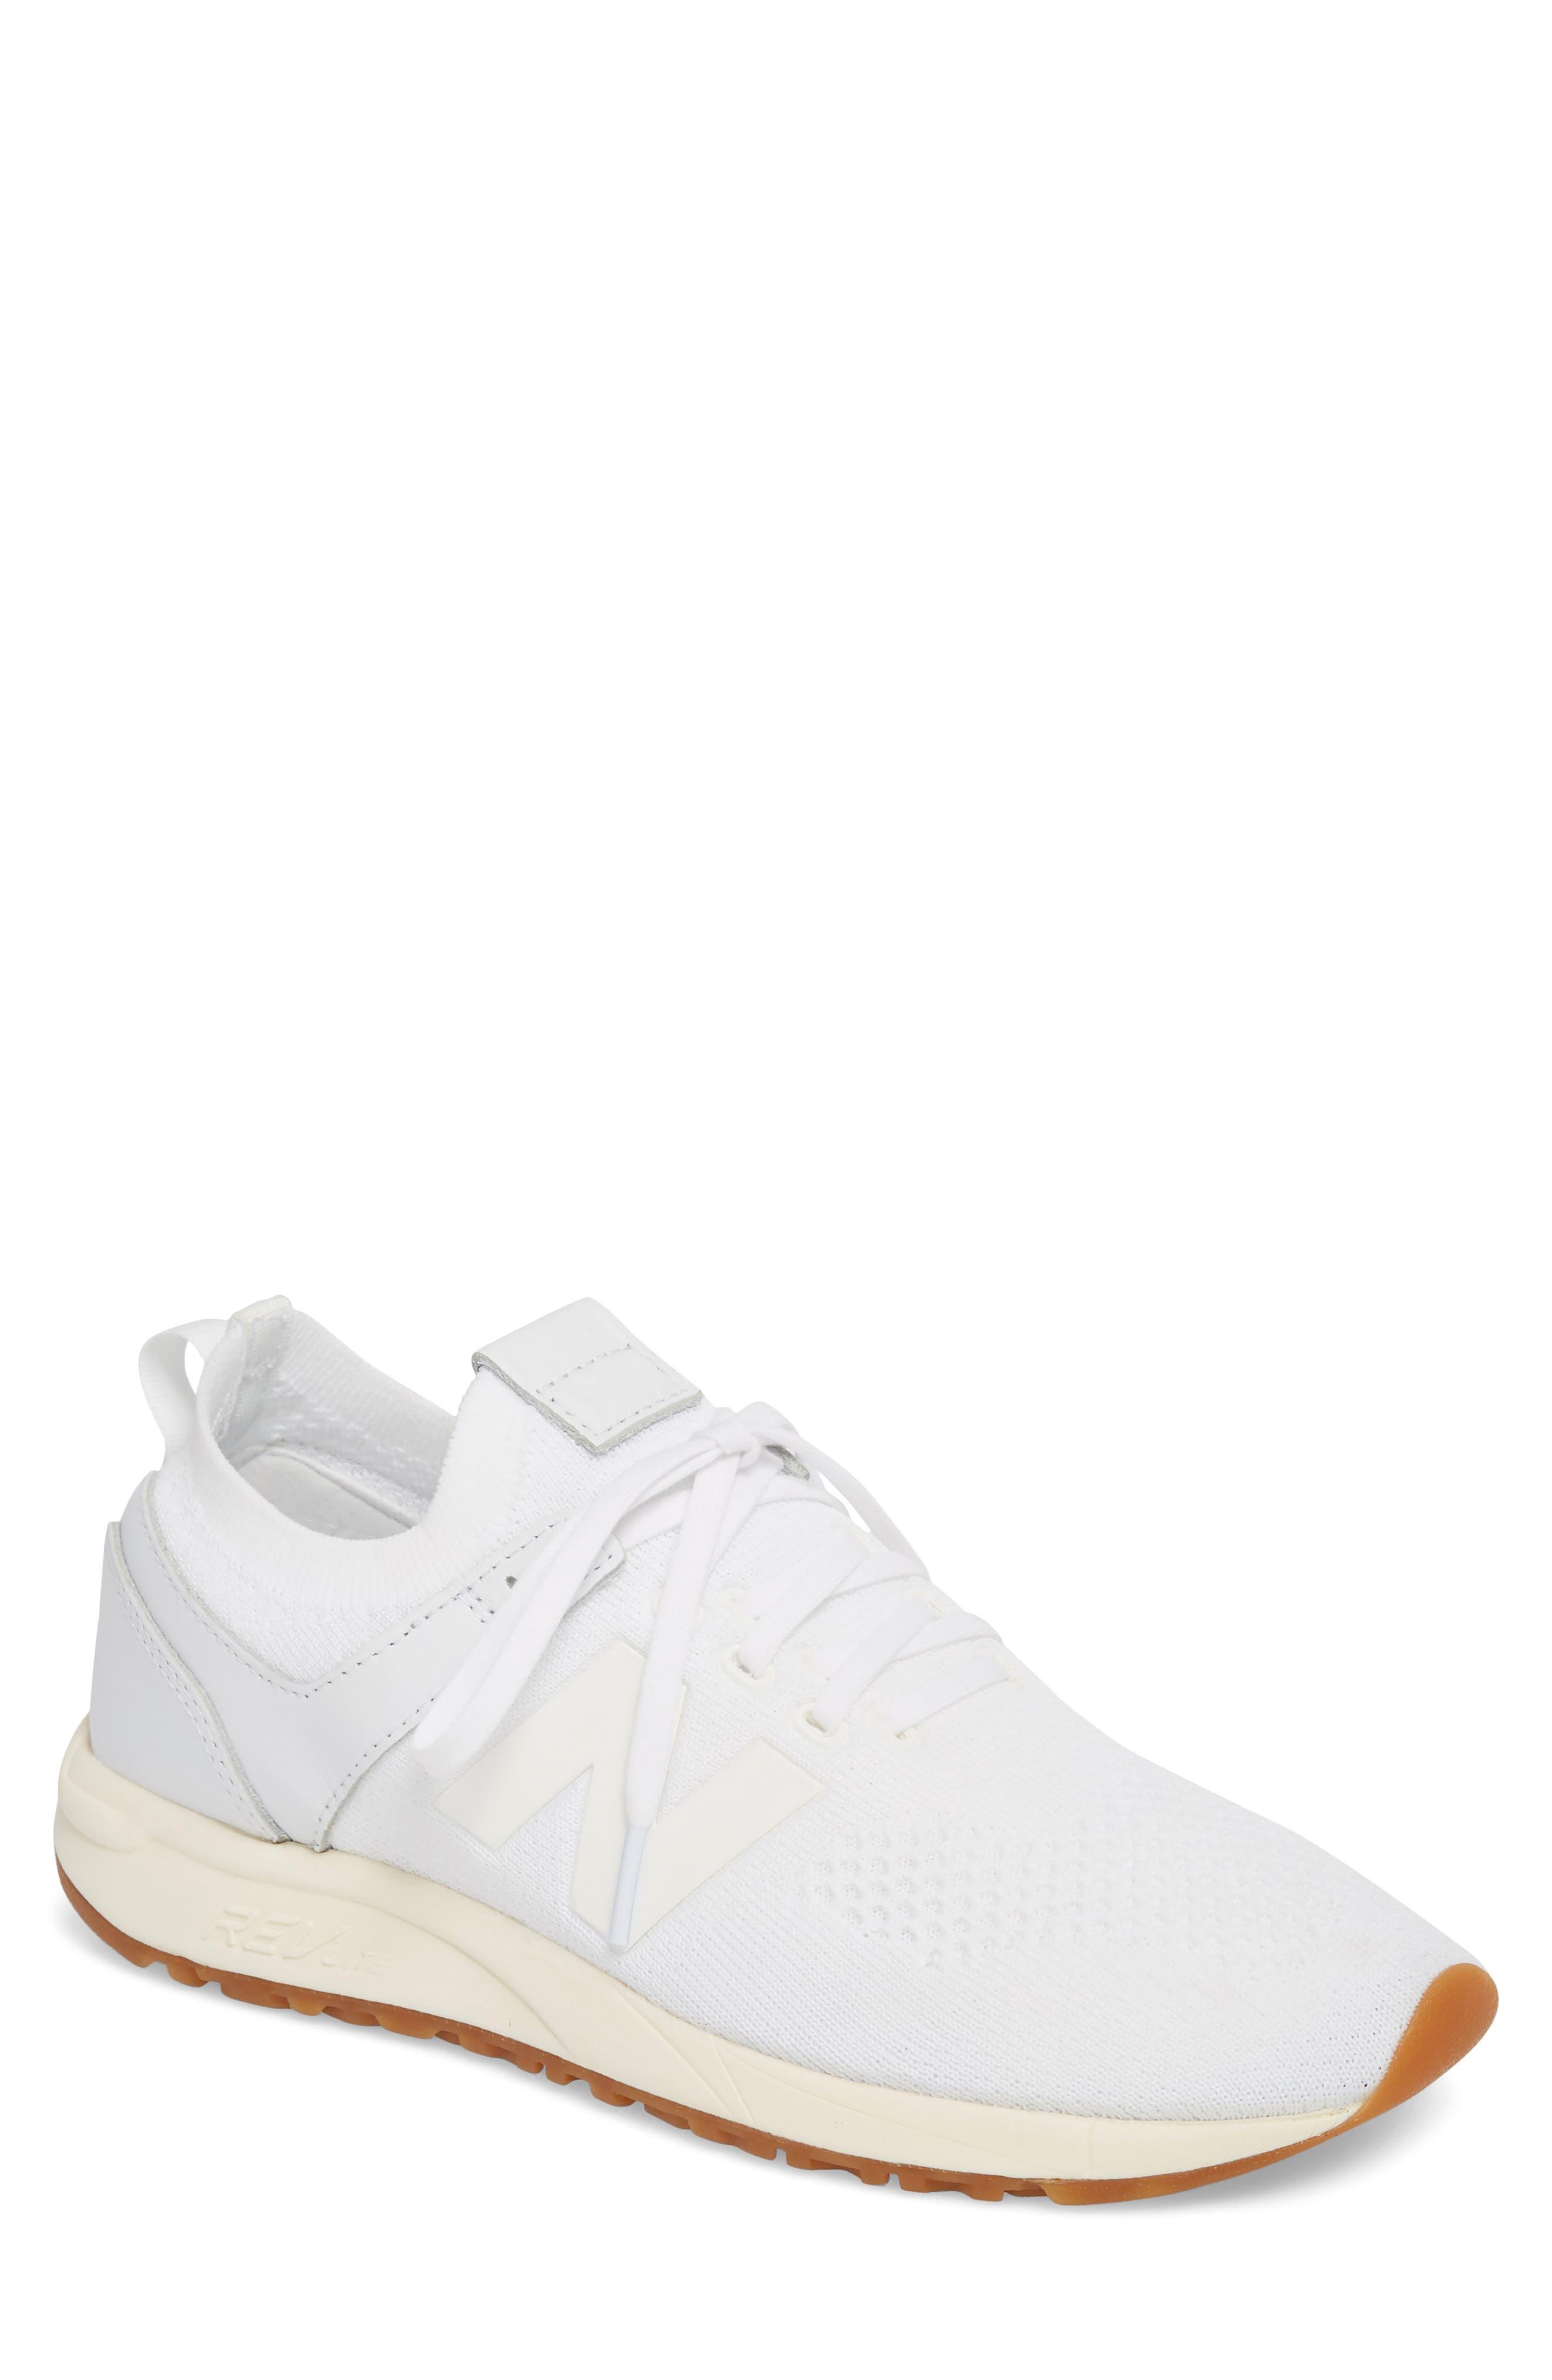 247 Decon Knit Sneaker,                             Main thumbnail 1, color,                             WHITE